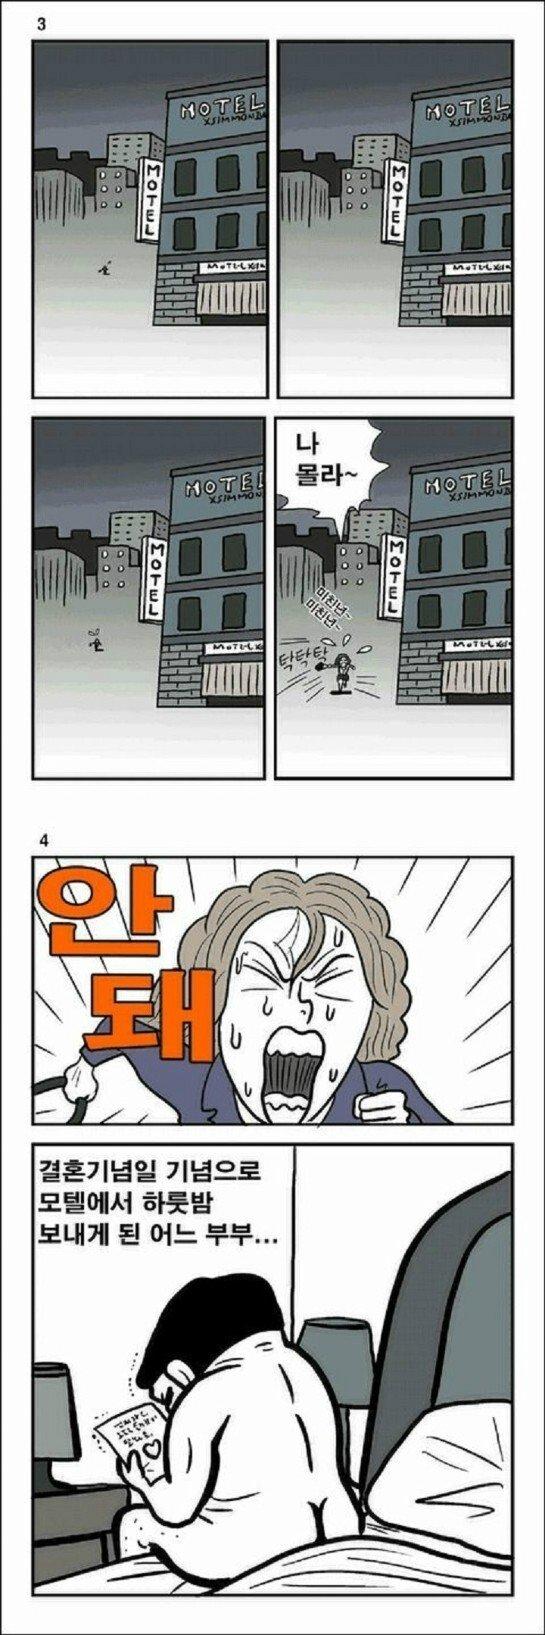 2.jpg 모텔에 간 유부녀. manhwa